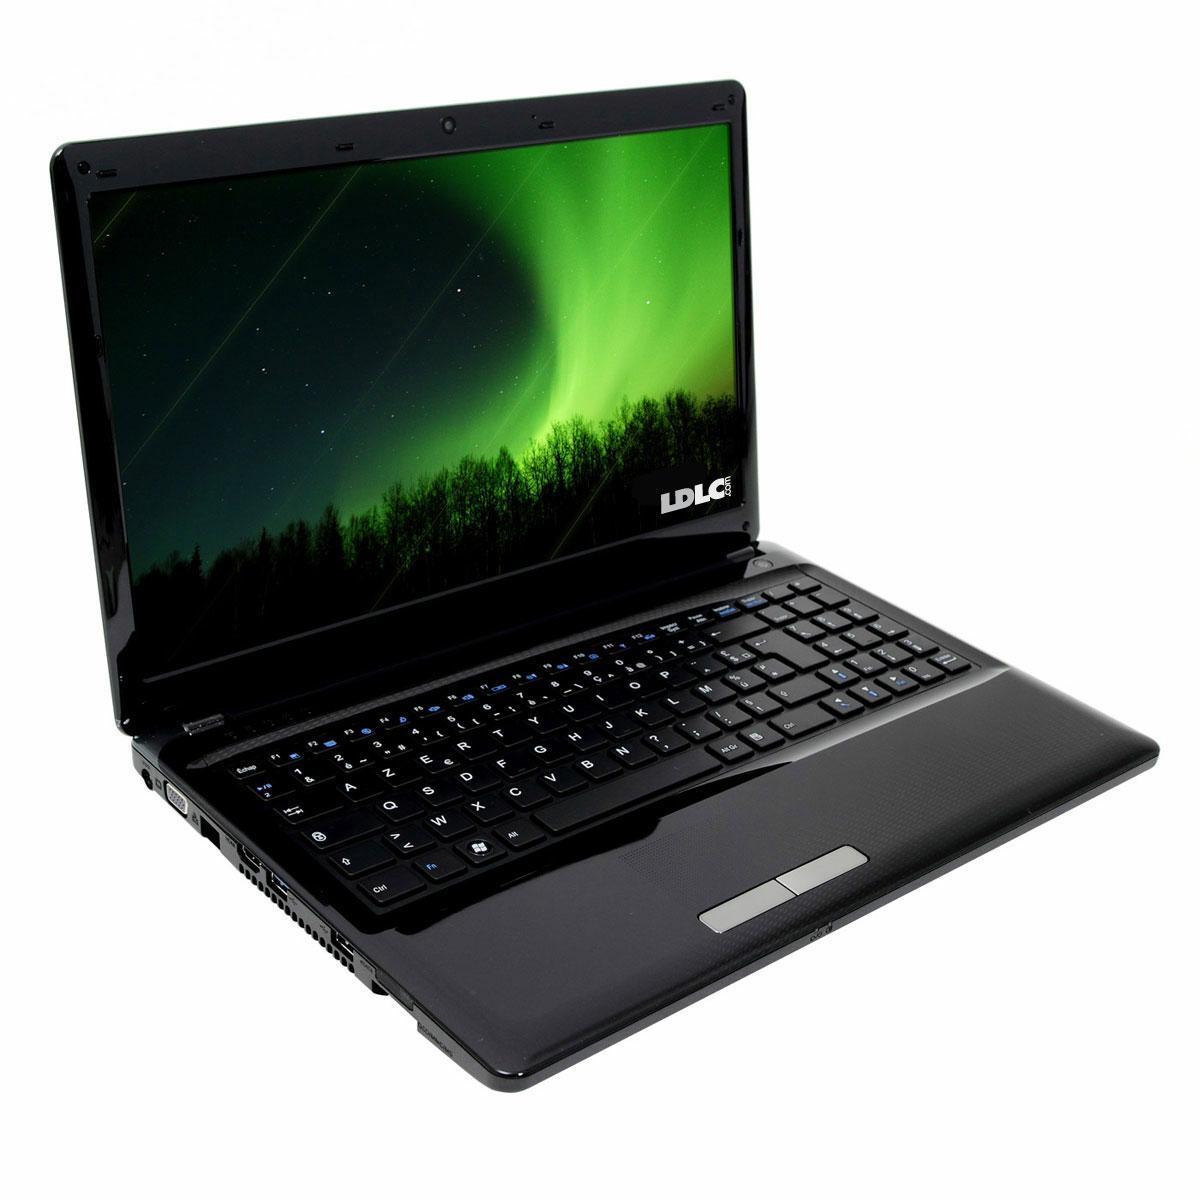 "PC portable LDLC Aurore BB3-I5-8-S2 Intel Core i5-3230M 8 Go SSD 240 Go 15.6"" LED Graveur DVD Wi-Fi N/Bluetooth Webcam (sans OS)"